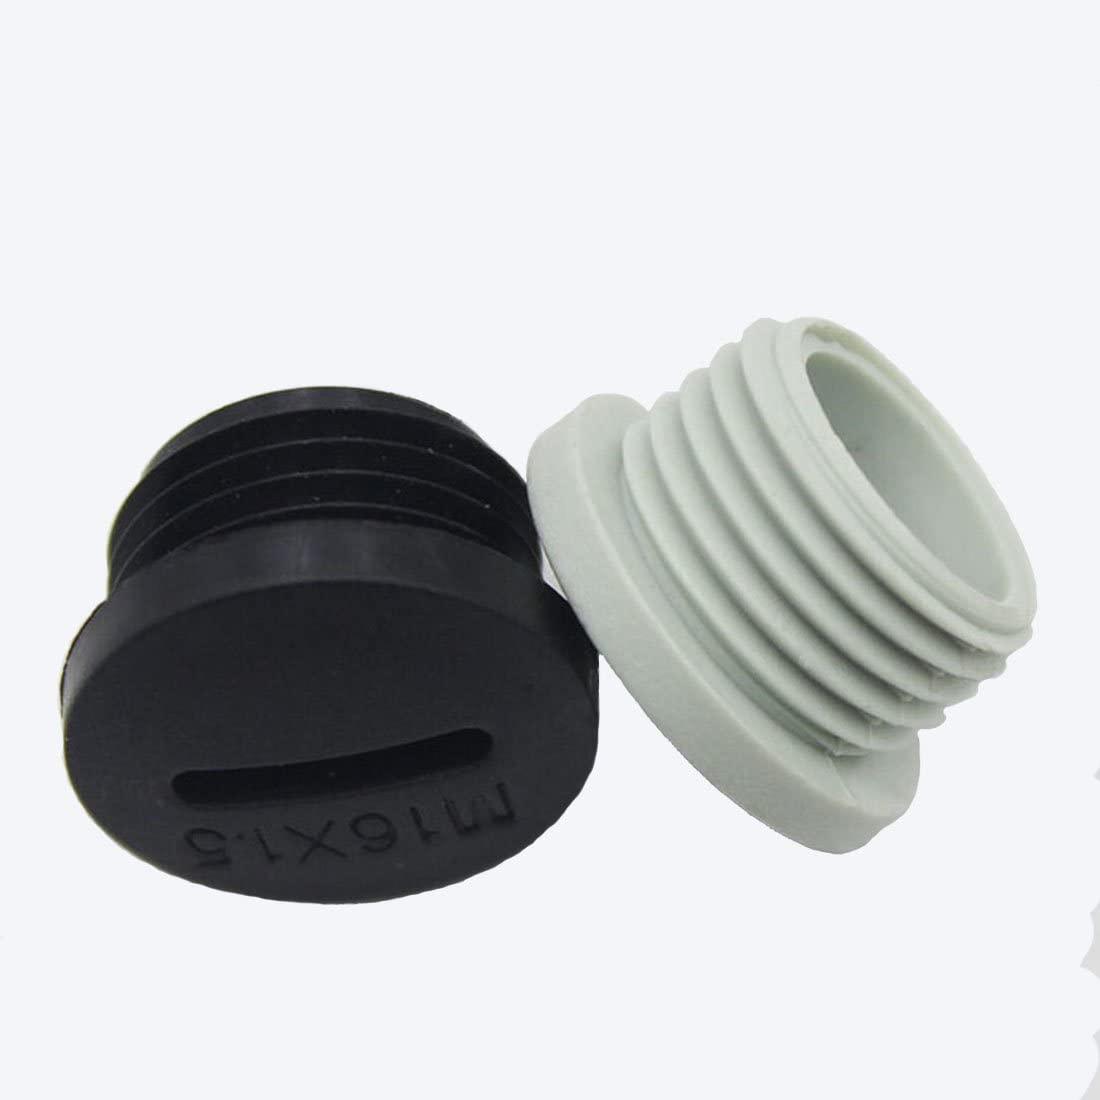 10Pcs M321.5 Black Plastic Hole Plugs Round Shaped Nylon Clogging Pieces